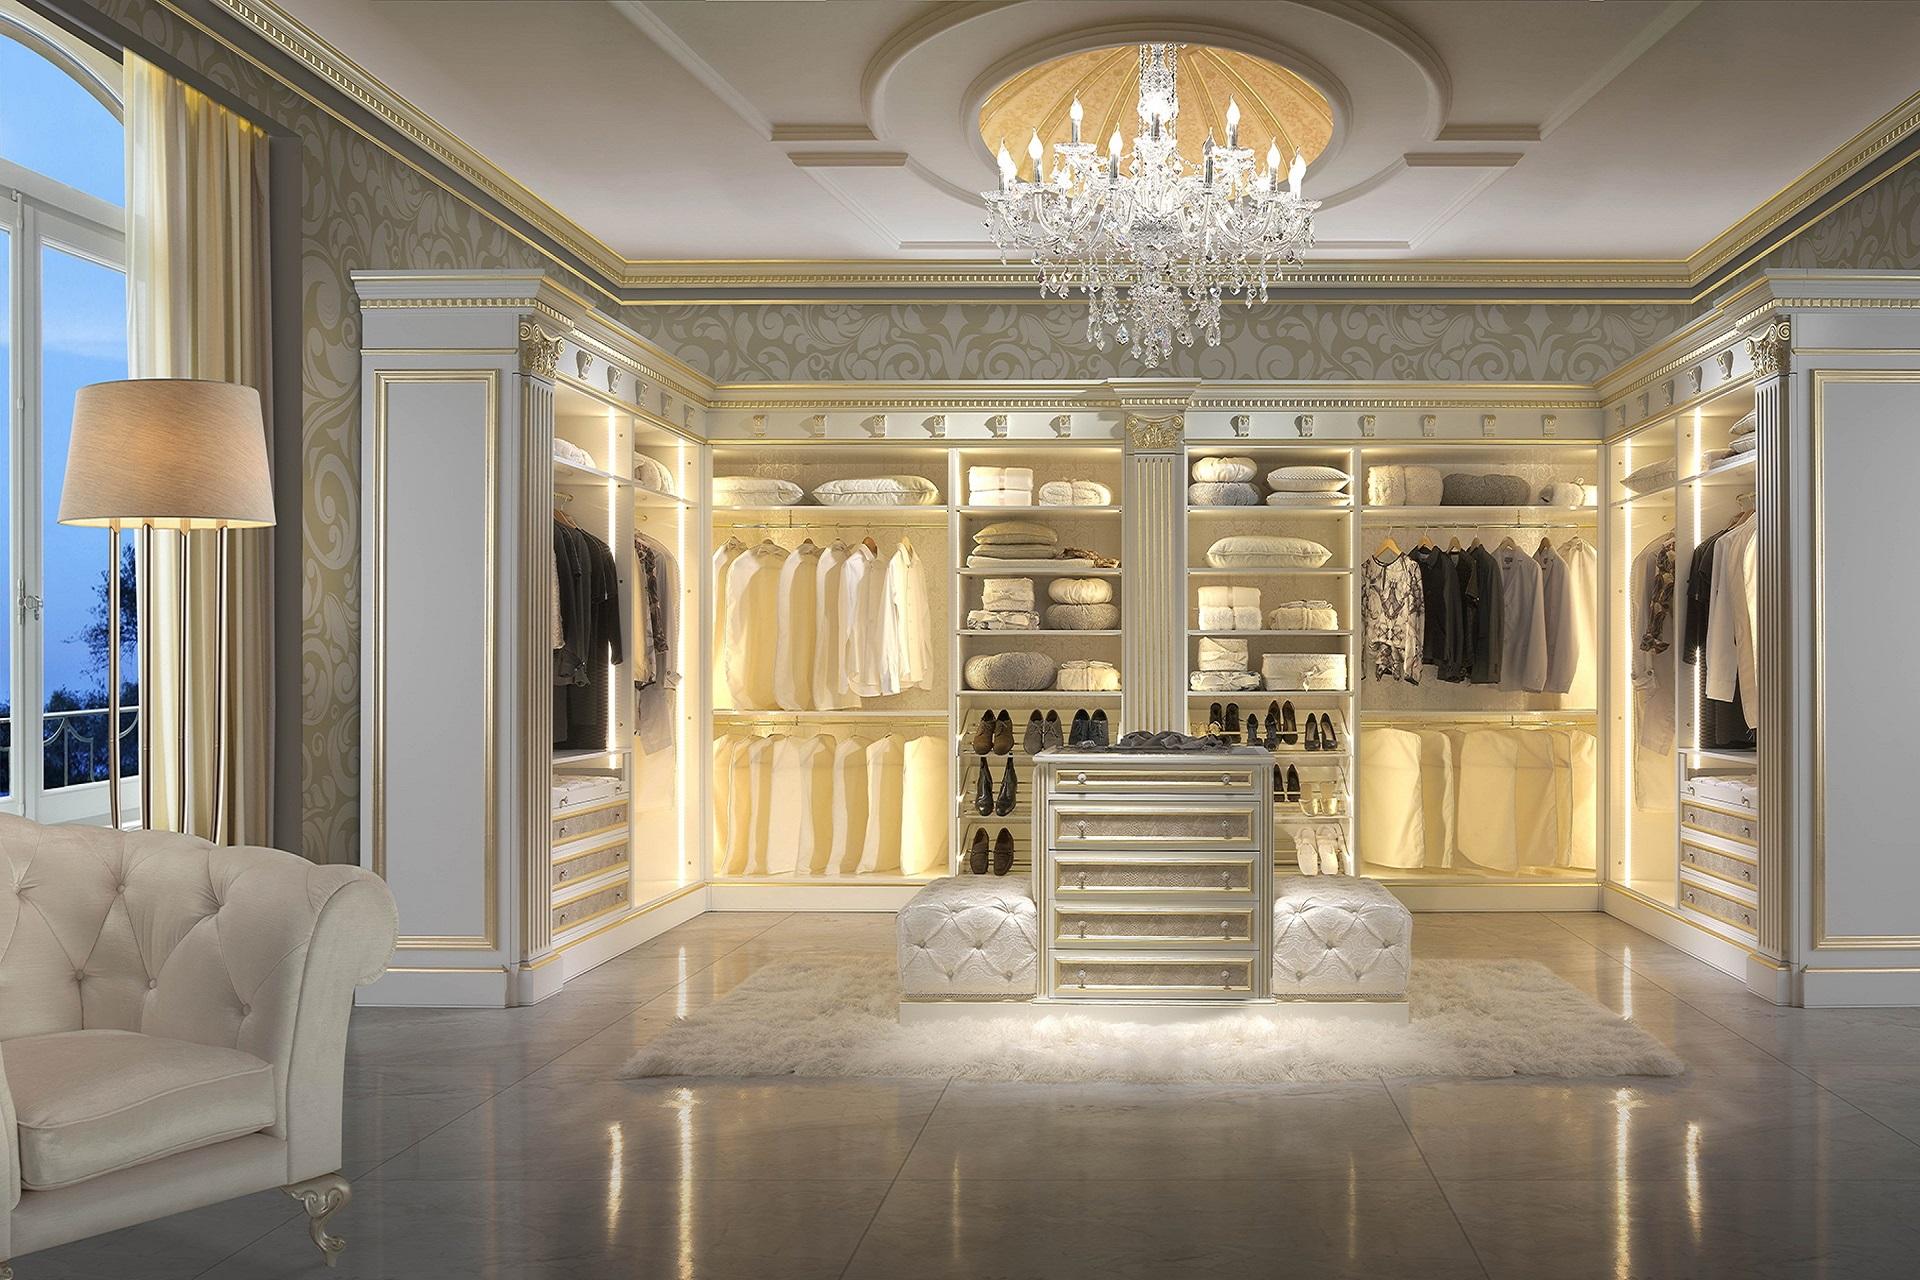 Luxury Dressing Rooms Muebles De Lujo Pic 243 Pico Luxury